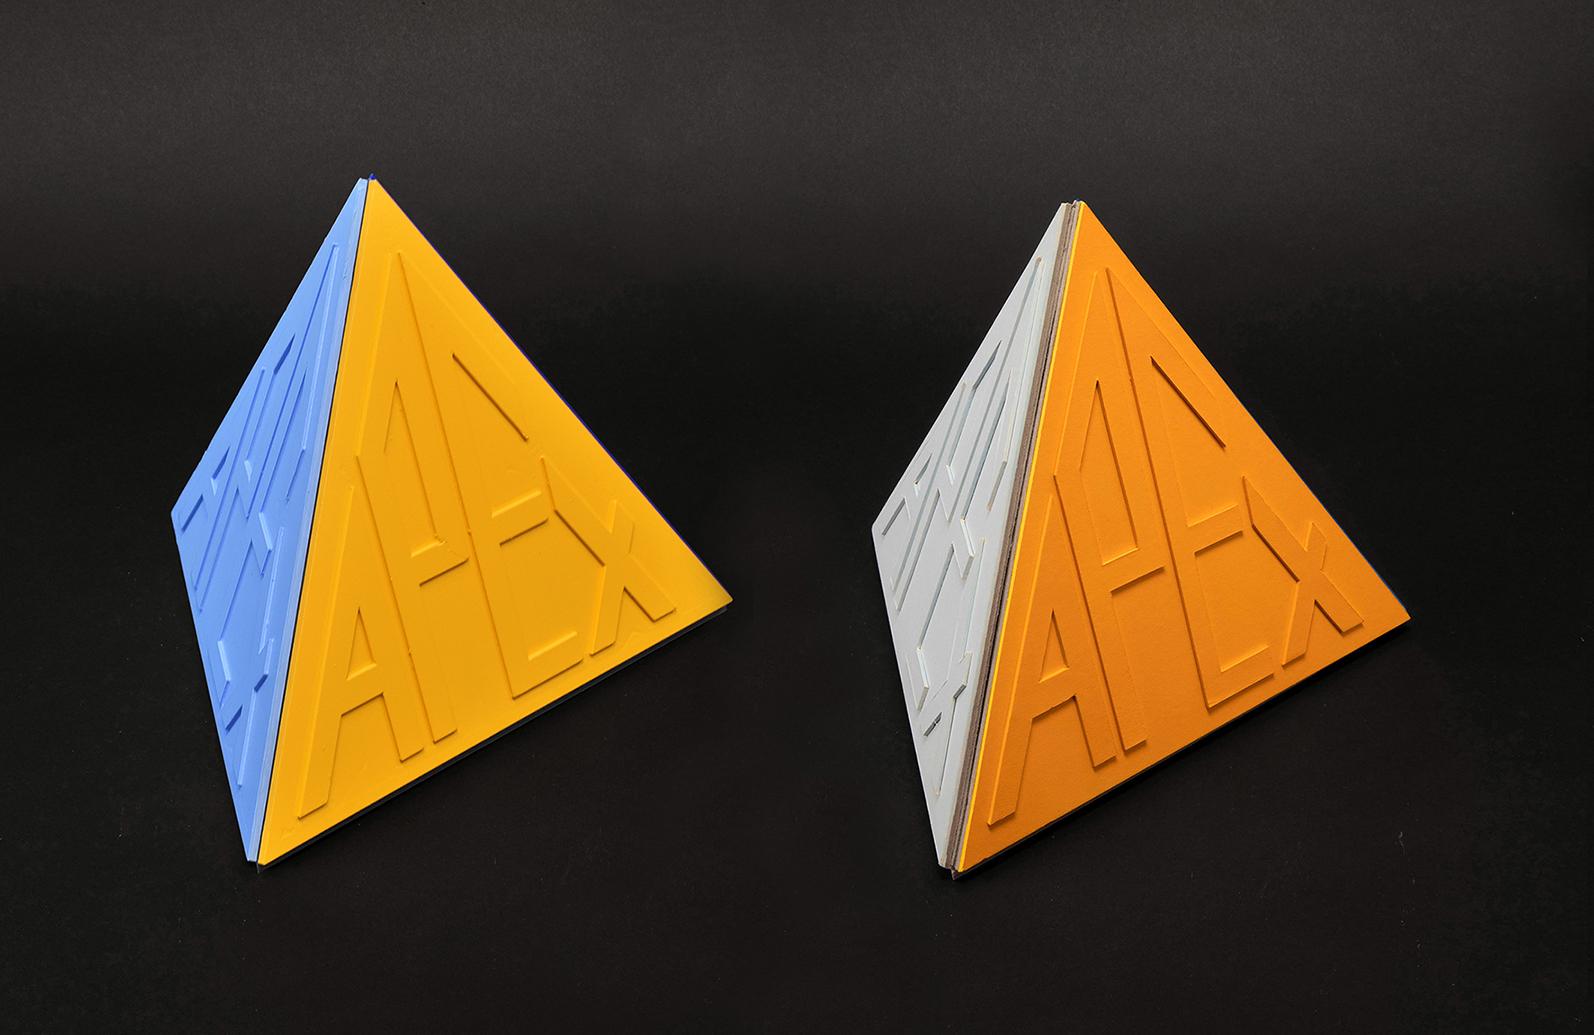 APEX 24x24x24cm (closed) left: 3d printed PLA, PVC, color spray right: cardboard, color spray